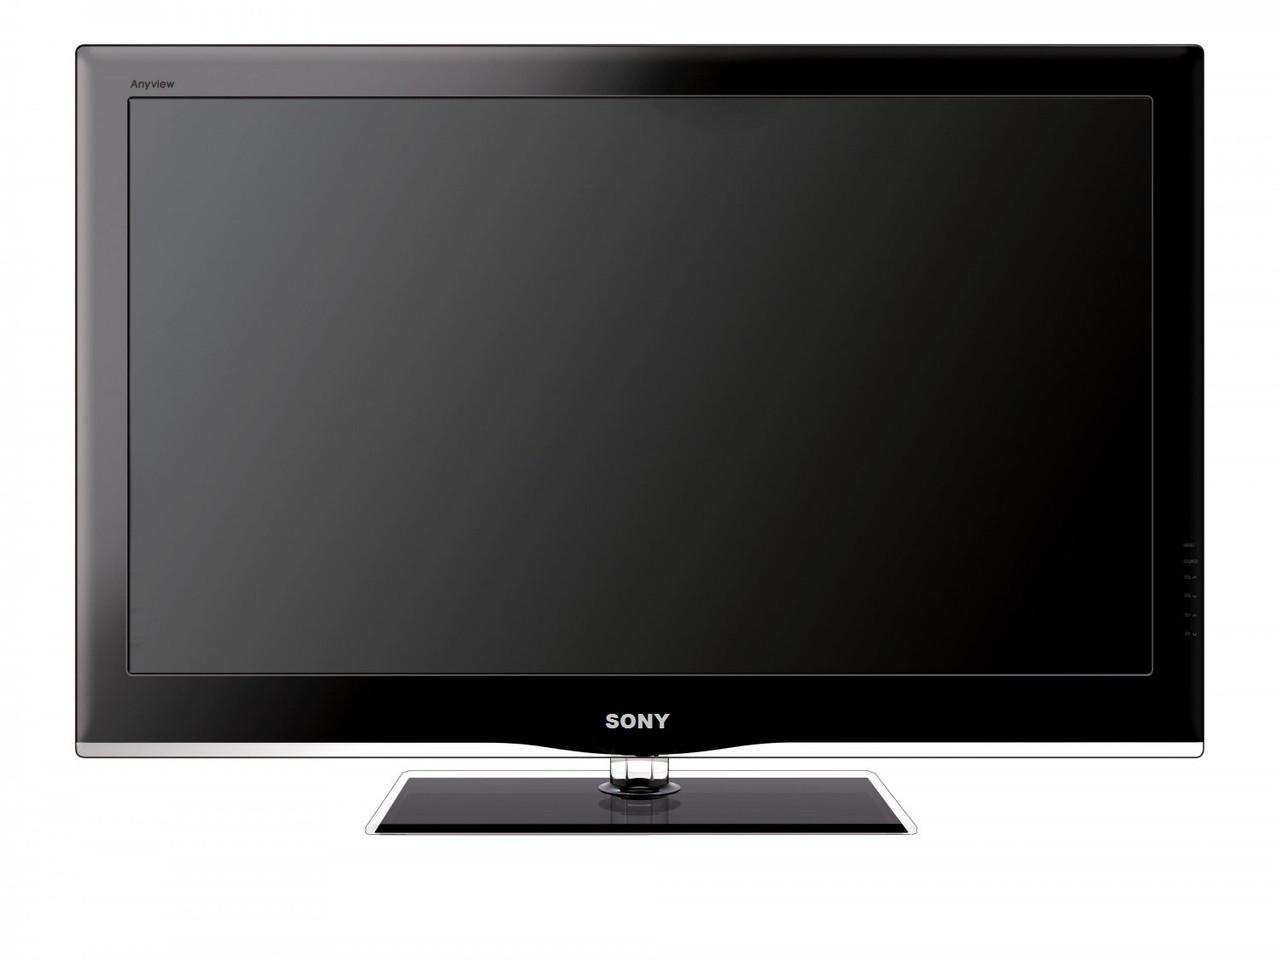 "Телевизор Sony TV Full HD 17"" дюймов  USB + SD + HDMI (12v и 220v)"